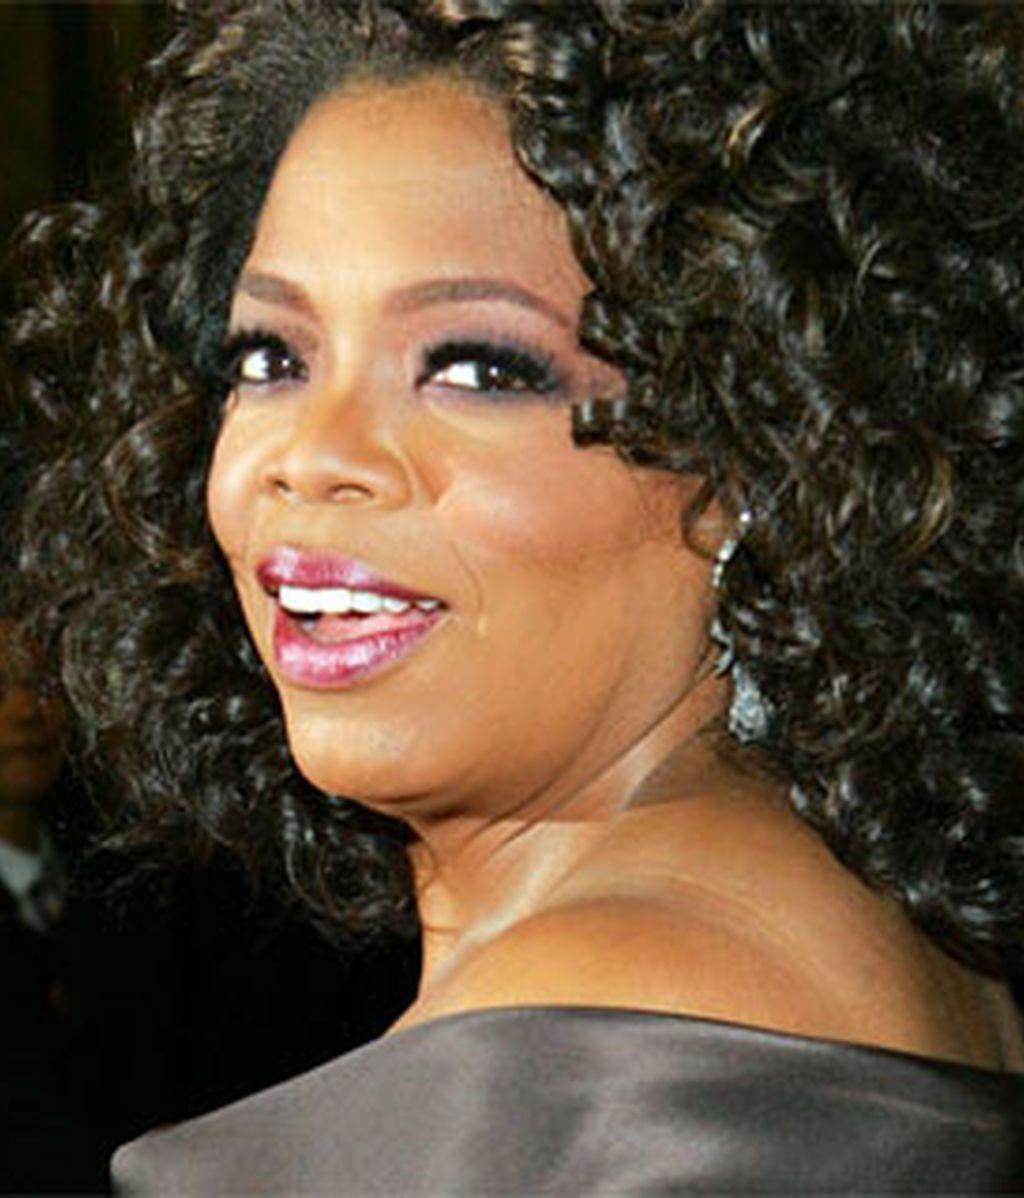 Oprah Winfrey en una imagen de archivo. Foto: AP